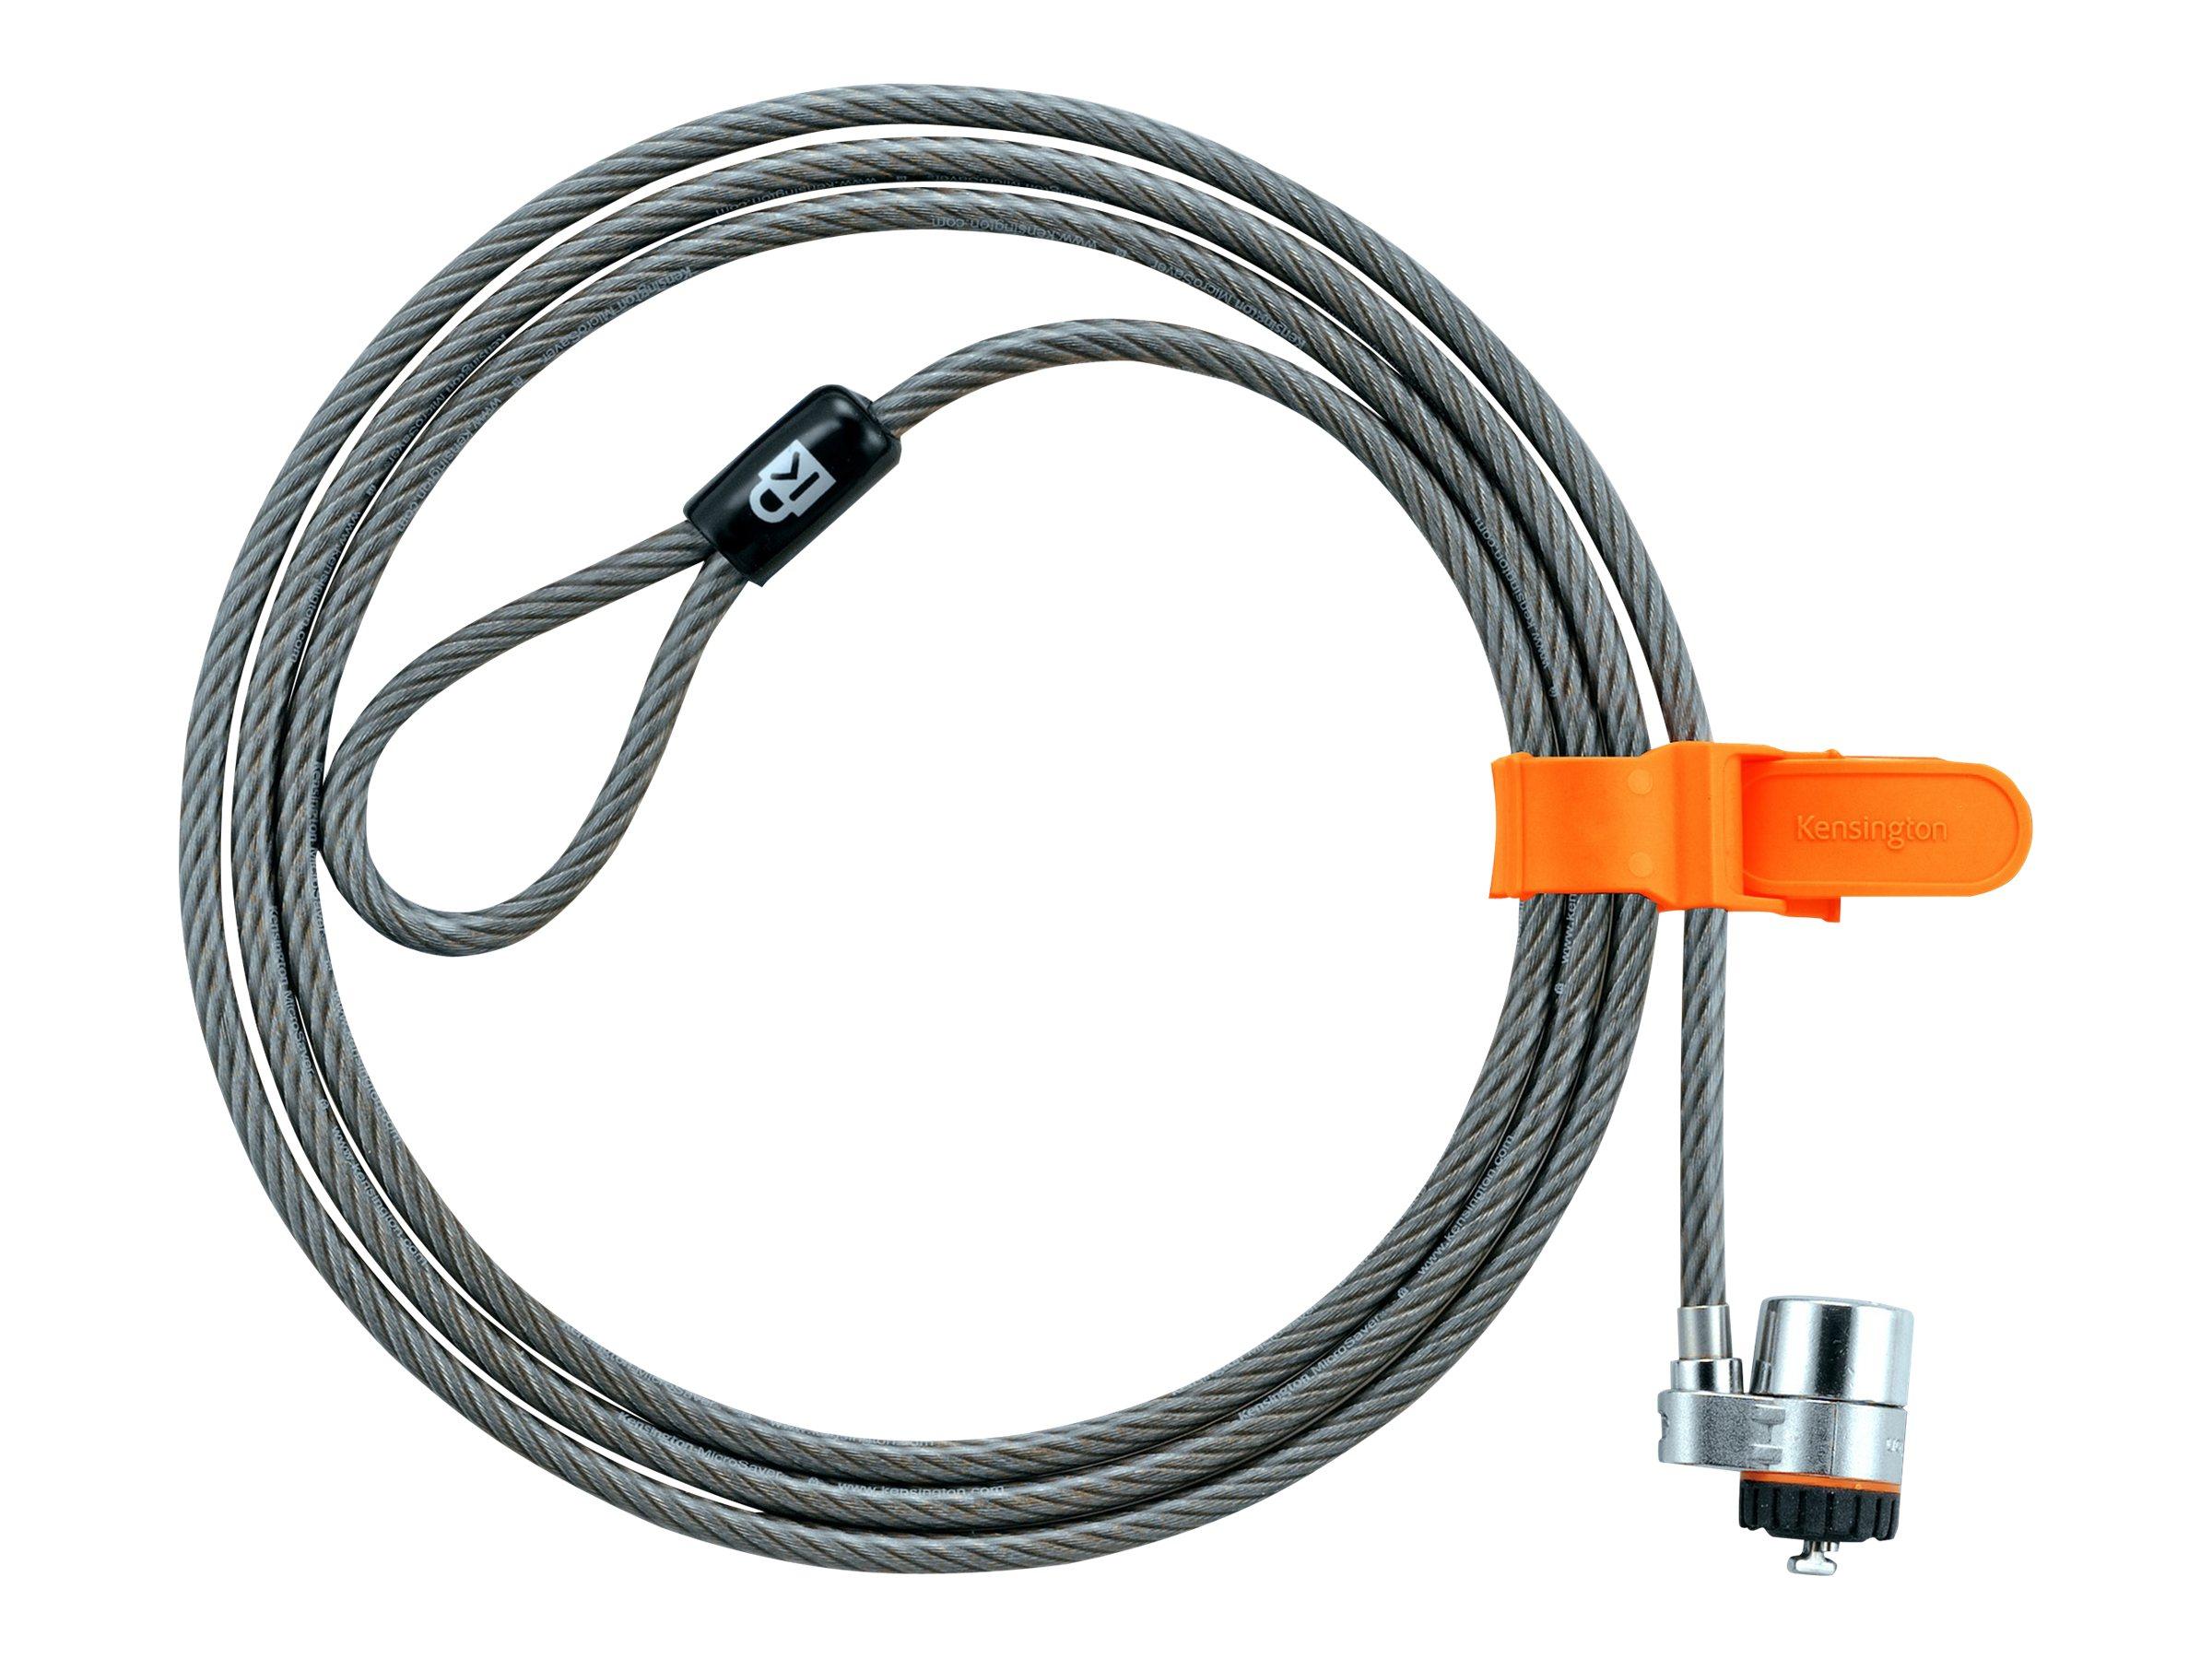 Kensington Slim MicroSaver security cable